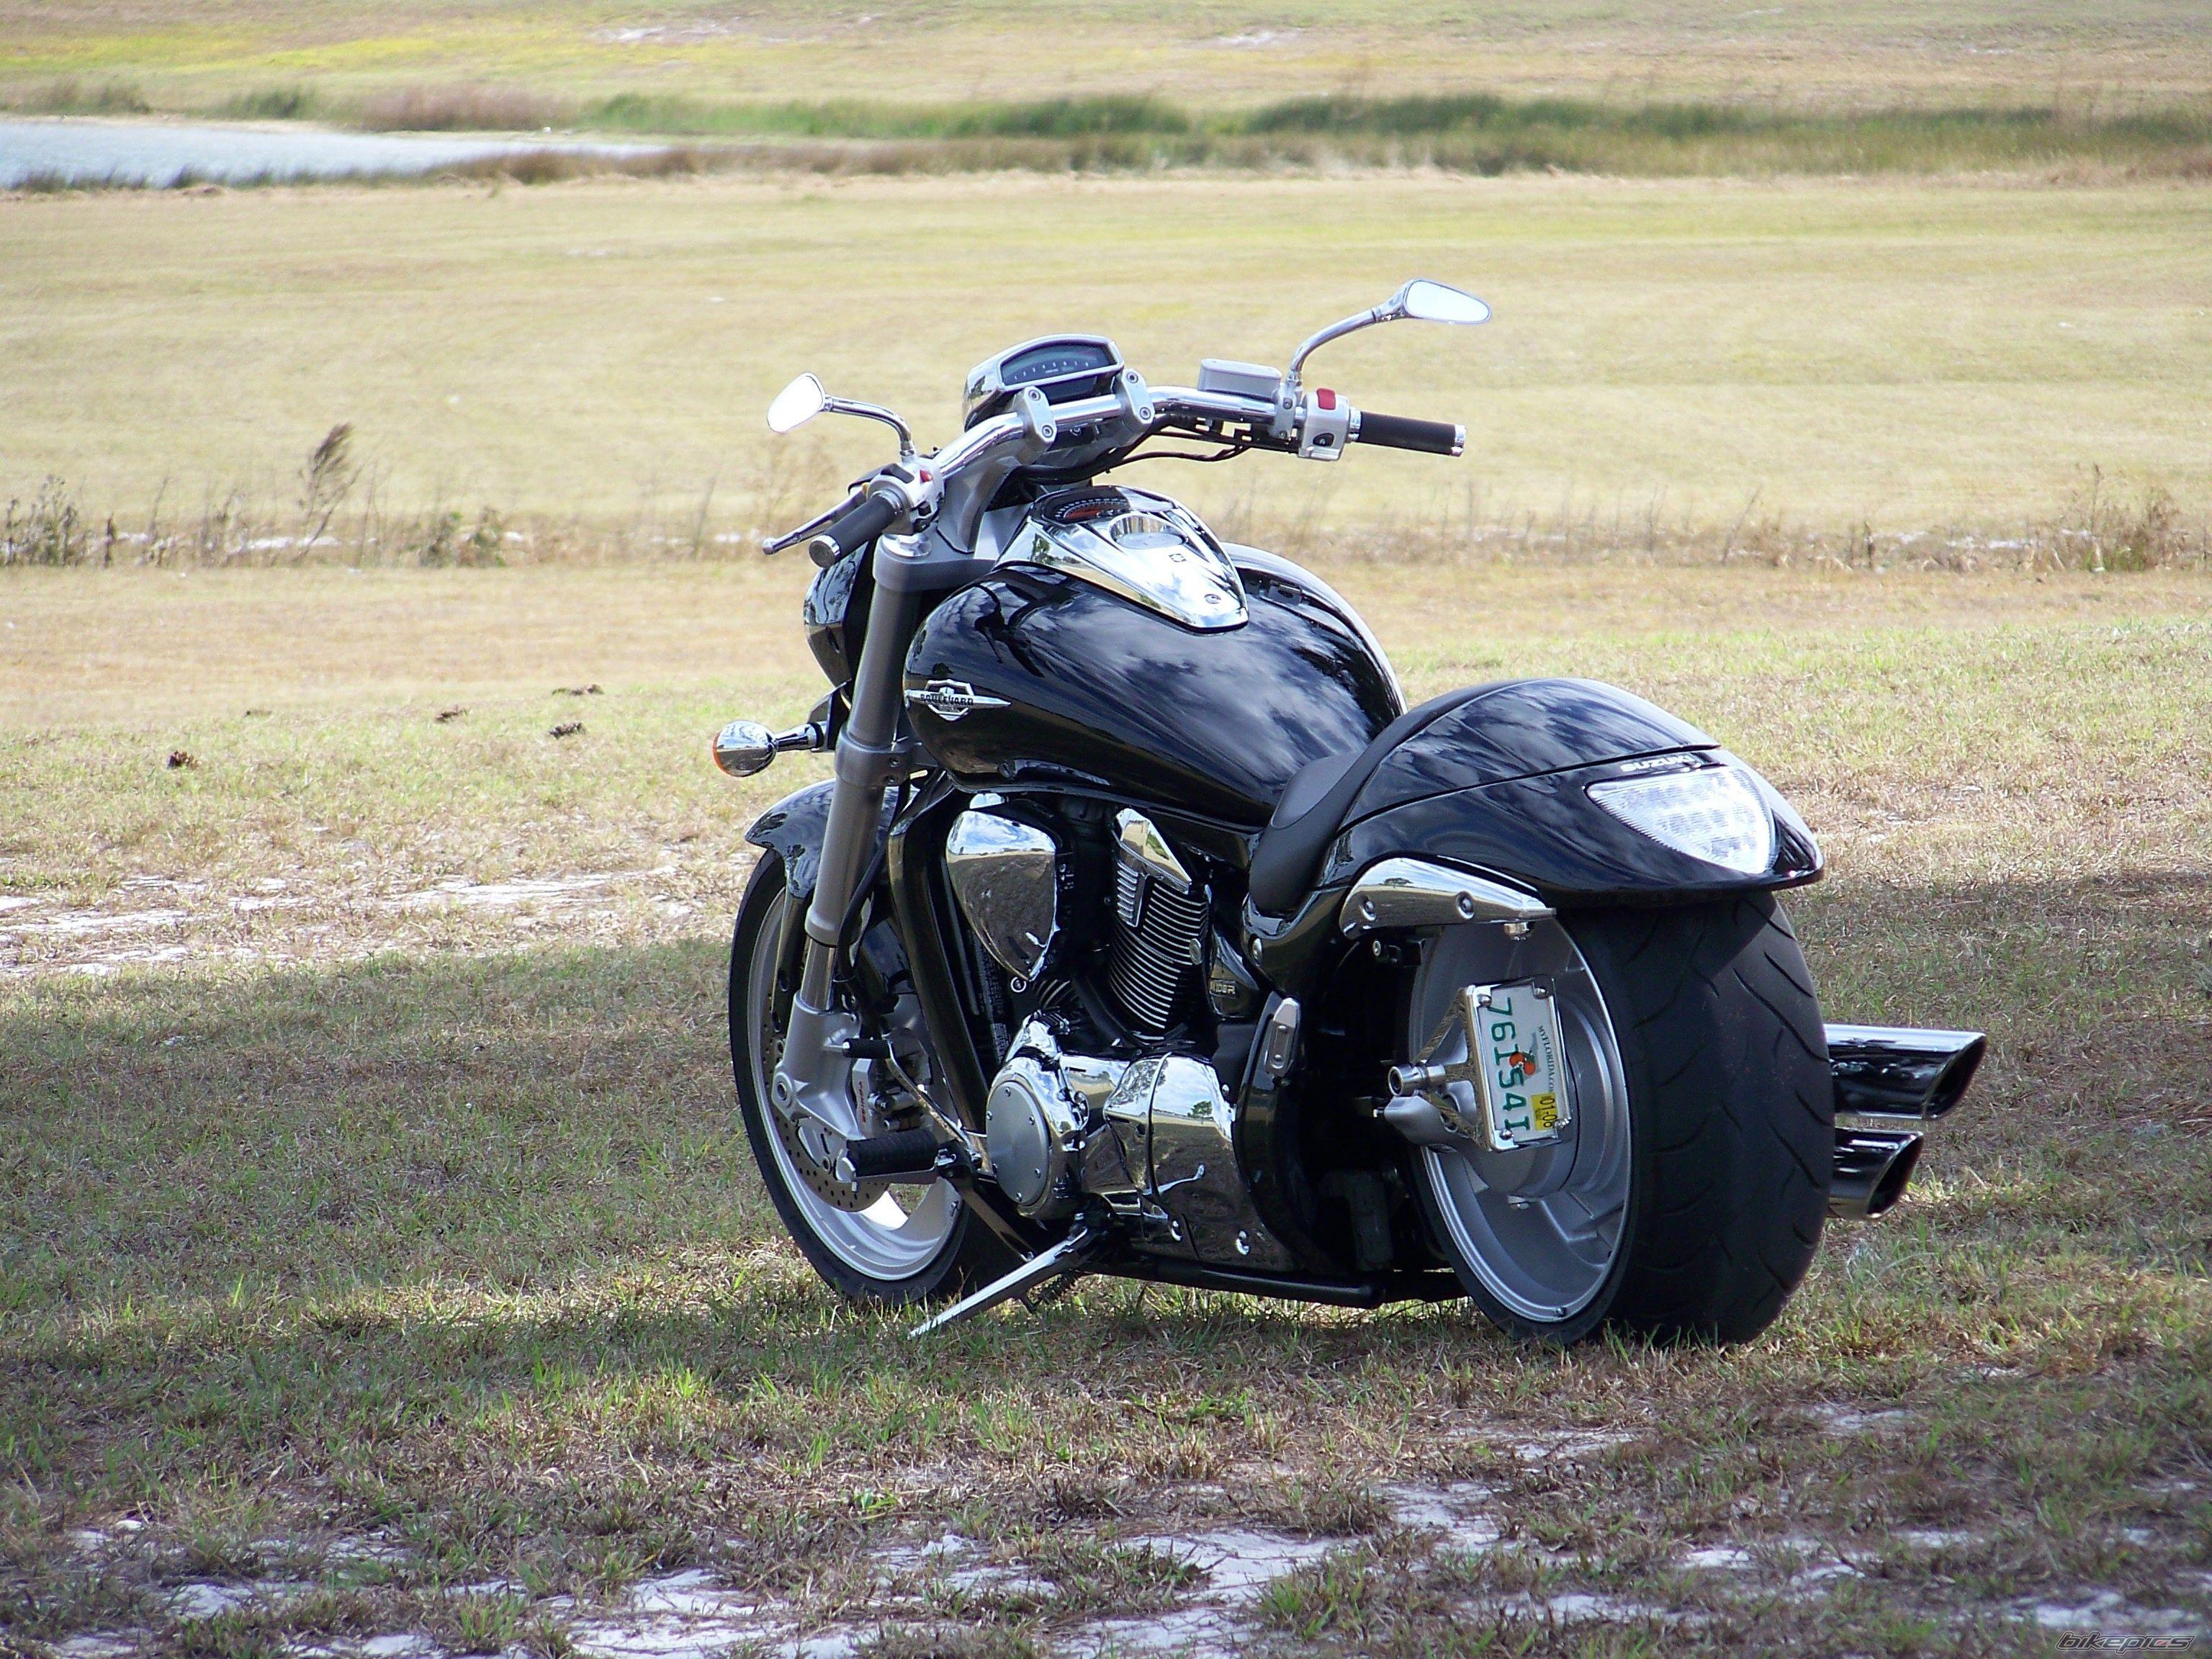 Megatwin motorcycle comparison suzuki boulevard m109r grounded garage pinterest kawasaki vulcan and honda